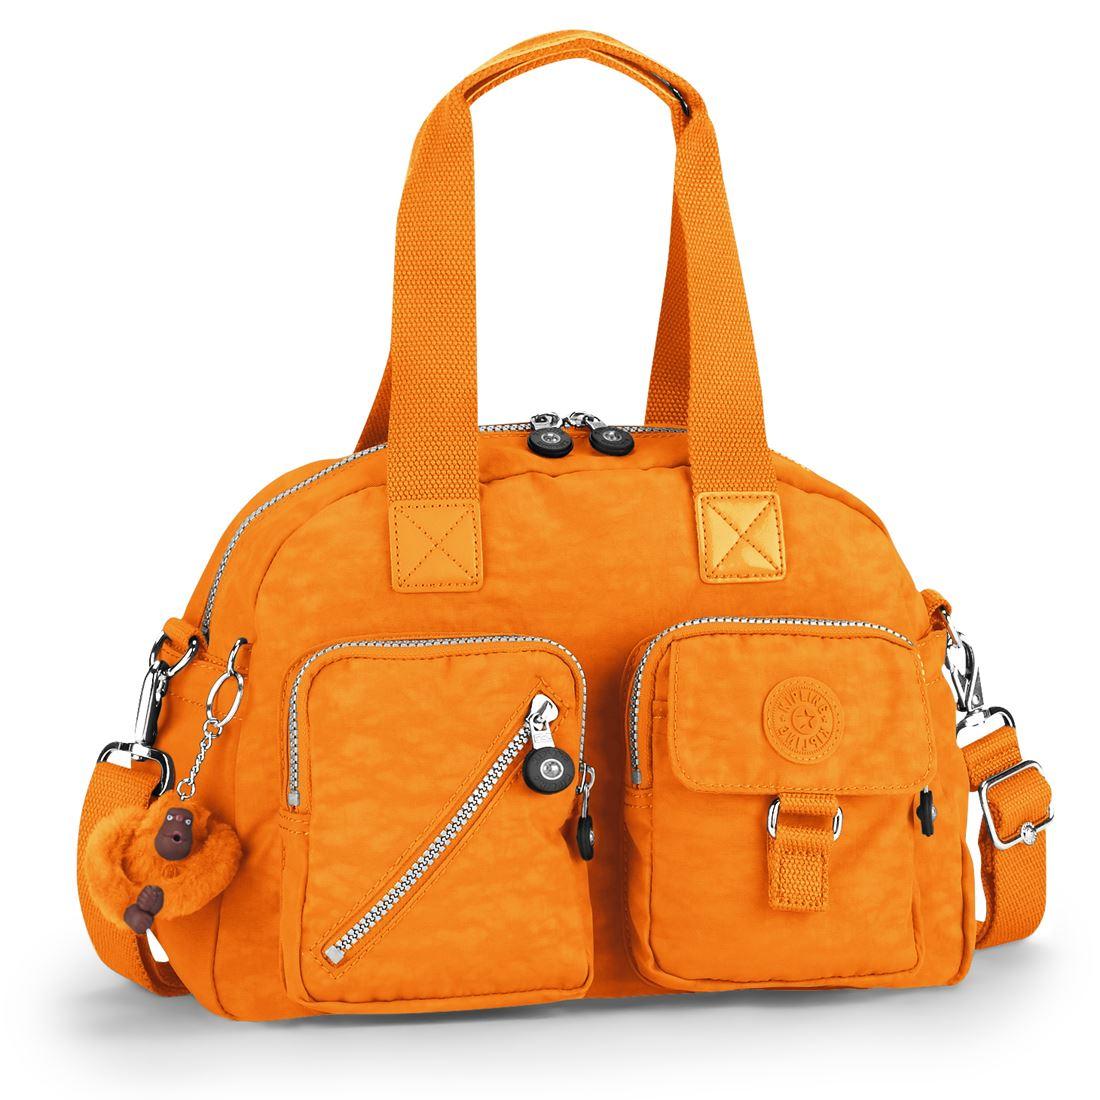 Simple Kipling GABBIE - Across Body Bag - Dazz Black Women Bags [1KI51H01F-Q12] - $85.23  Kipling Bags ...